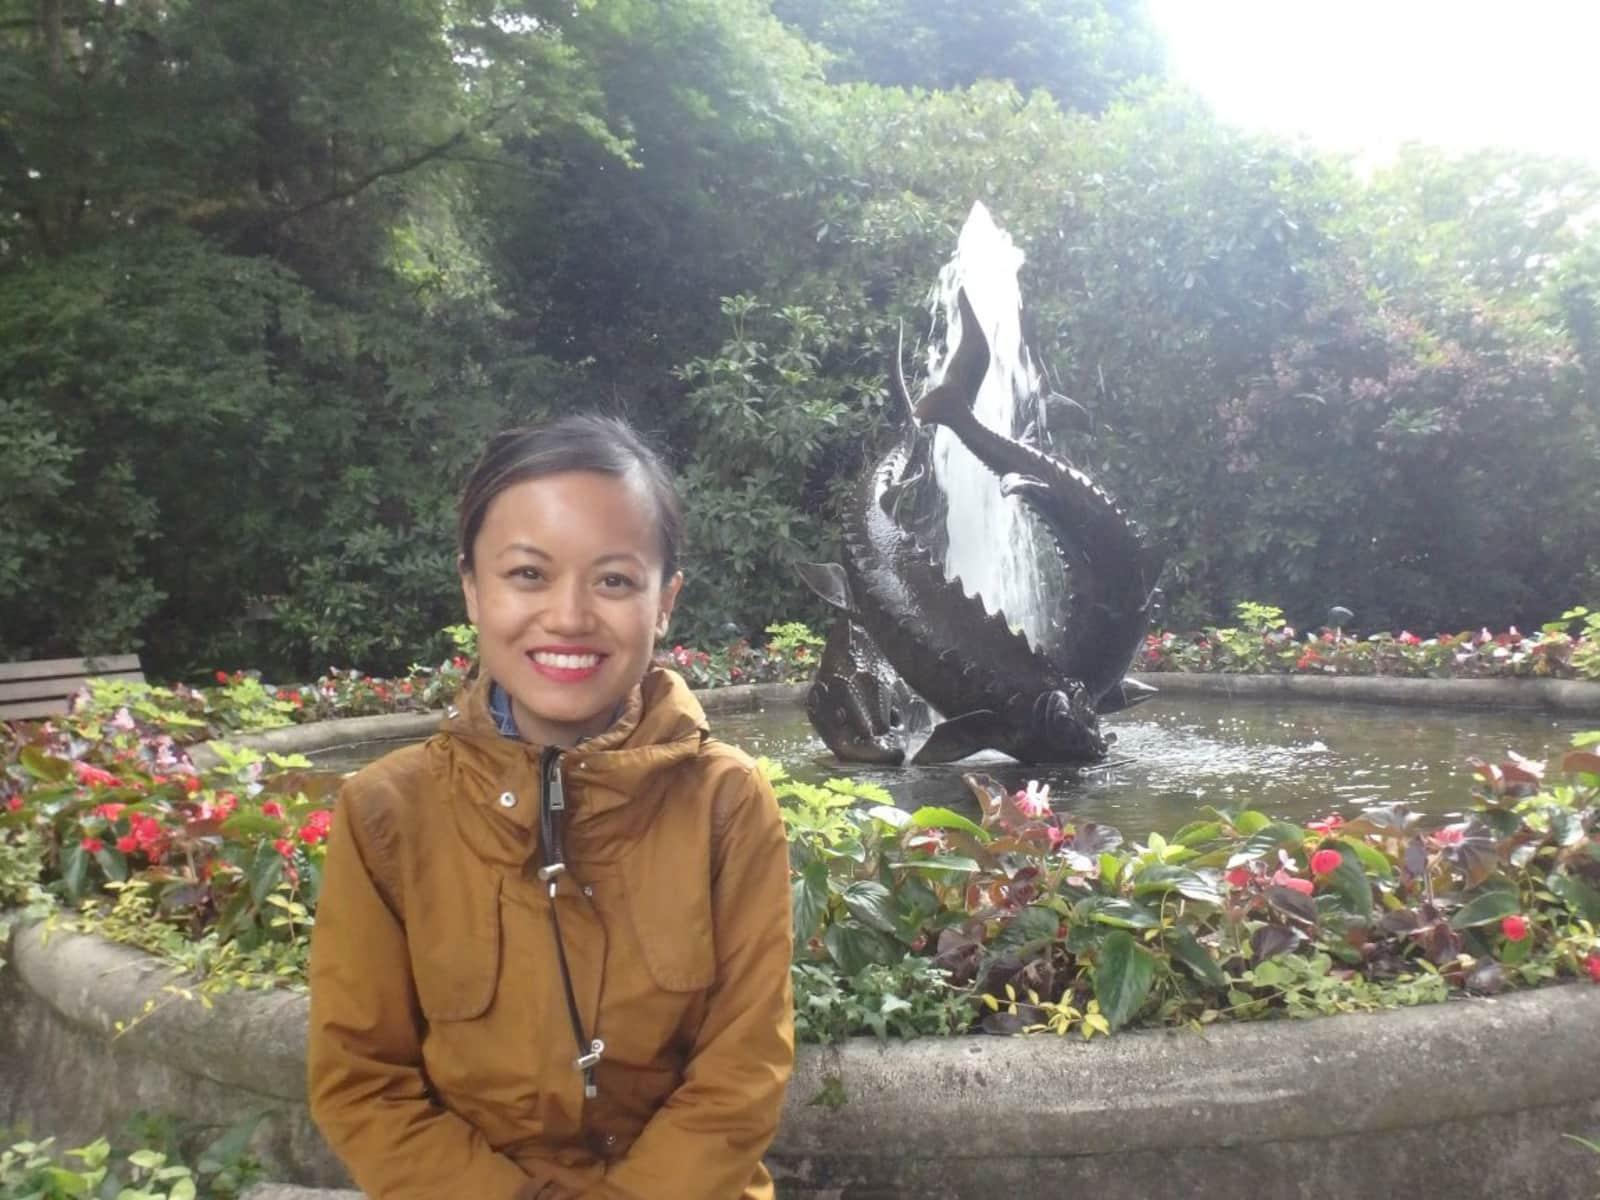 Stefanie from Toronto, Ontario, Canada